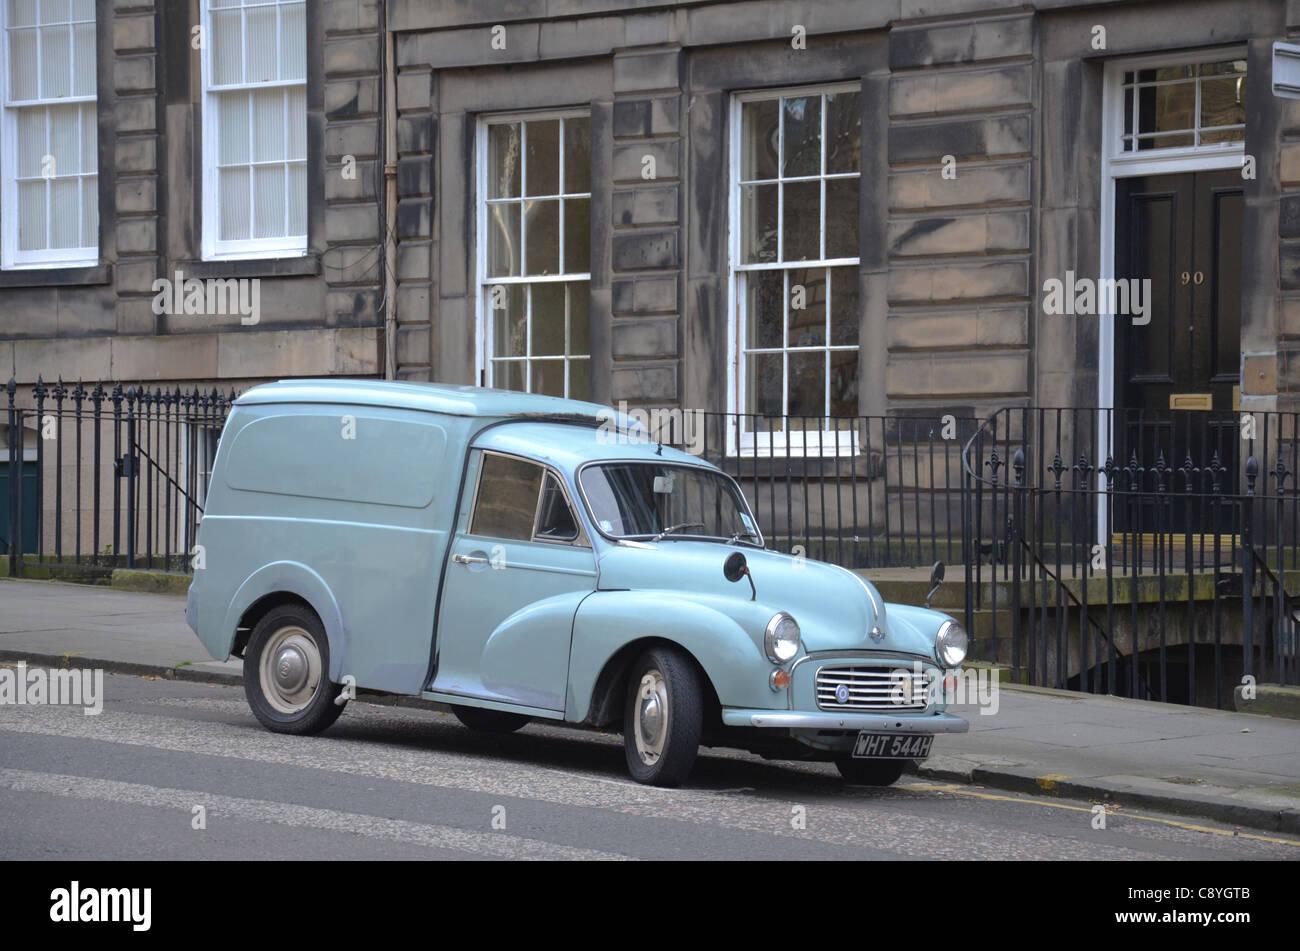 Morris Minor van parked in Edinburgh's New Town. - Stock Image